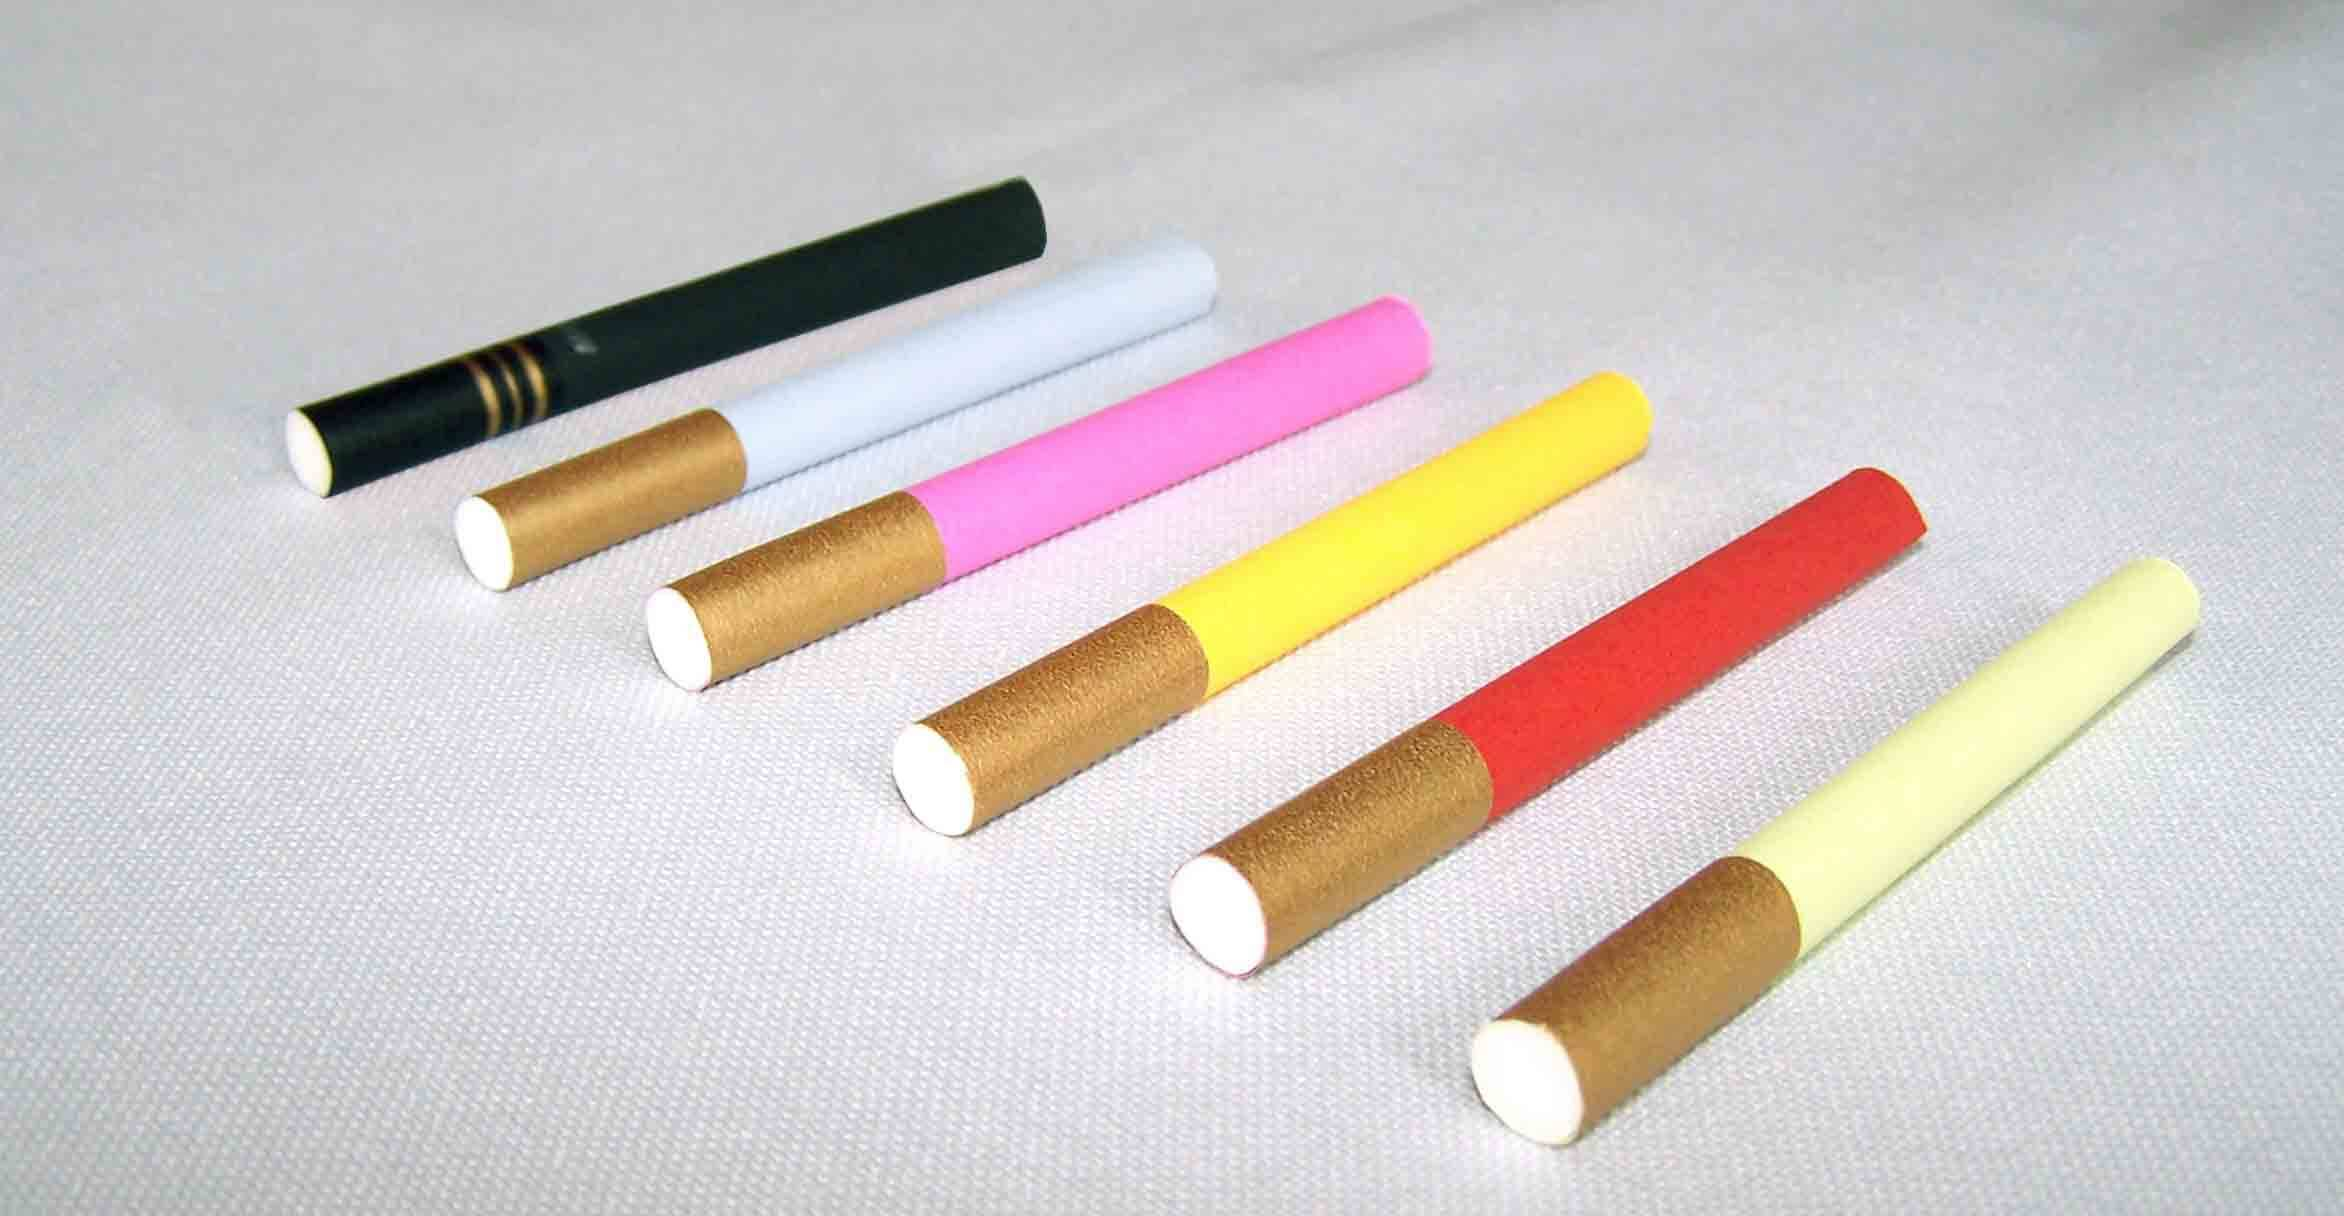 Much Mild Seven cigarette pack